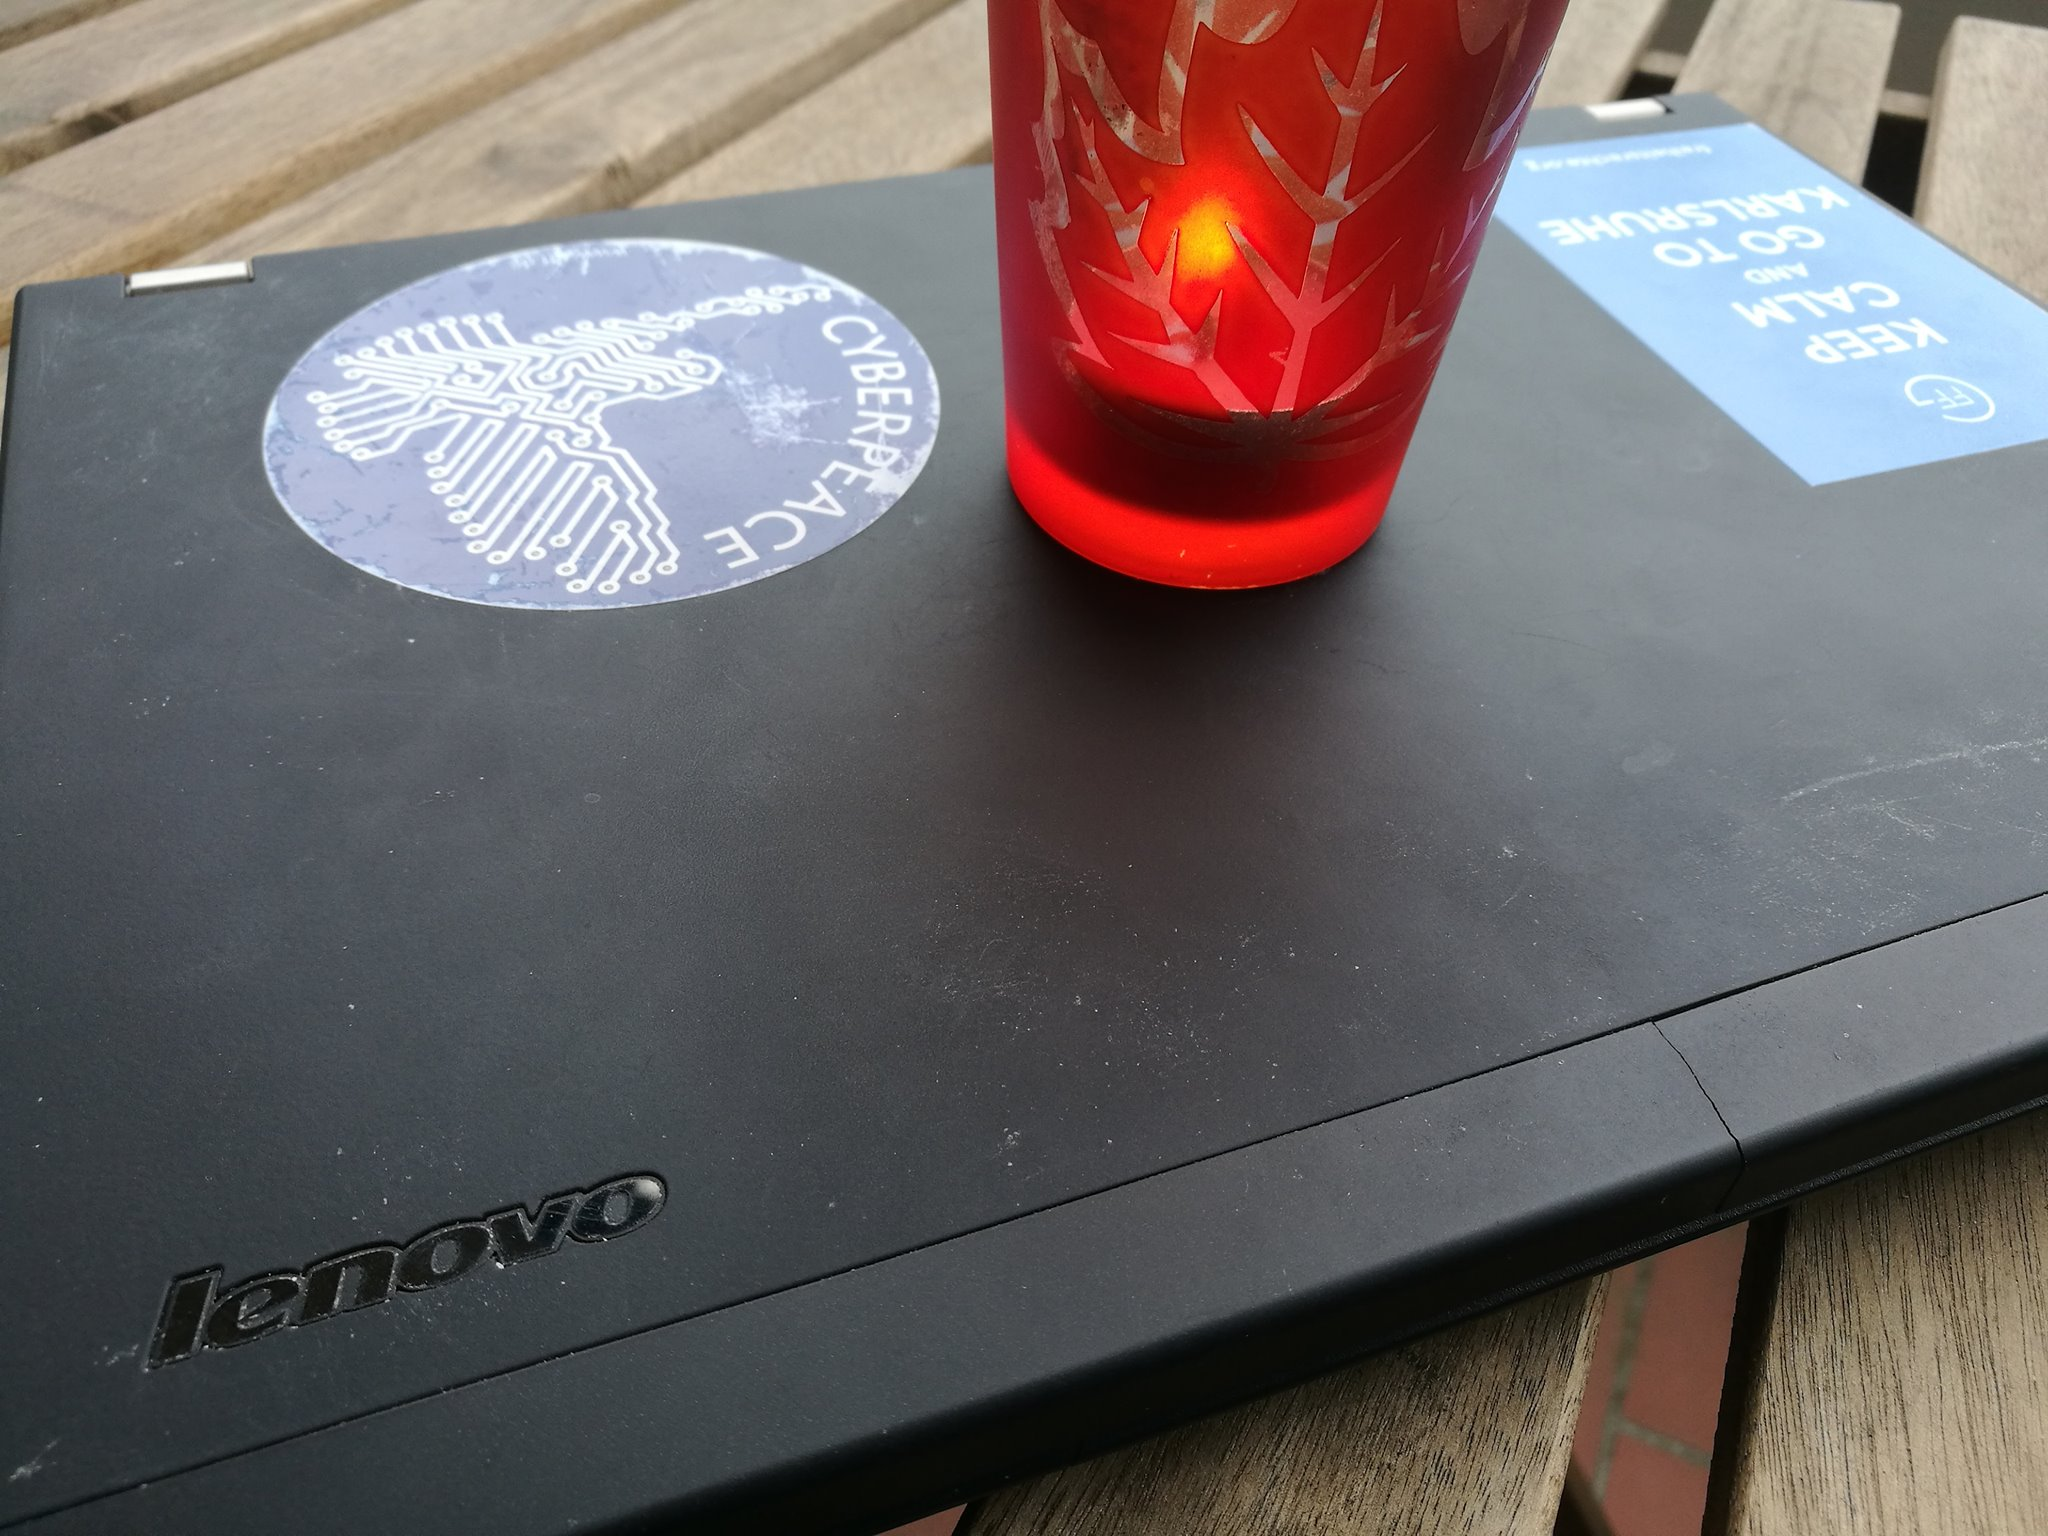 Kerze auf Laptop